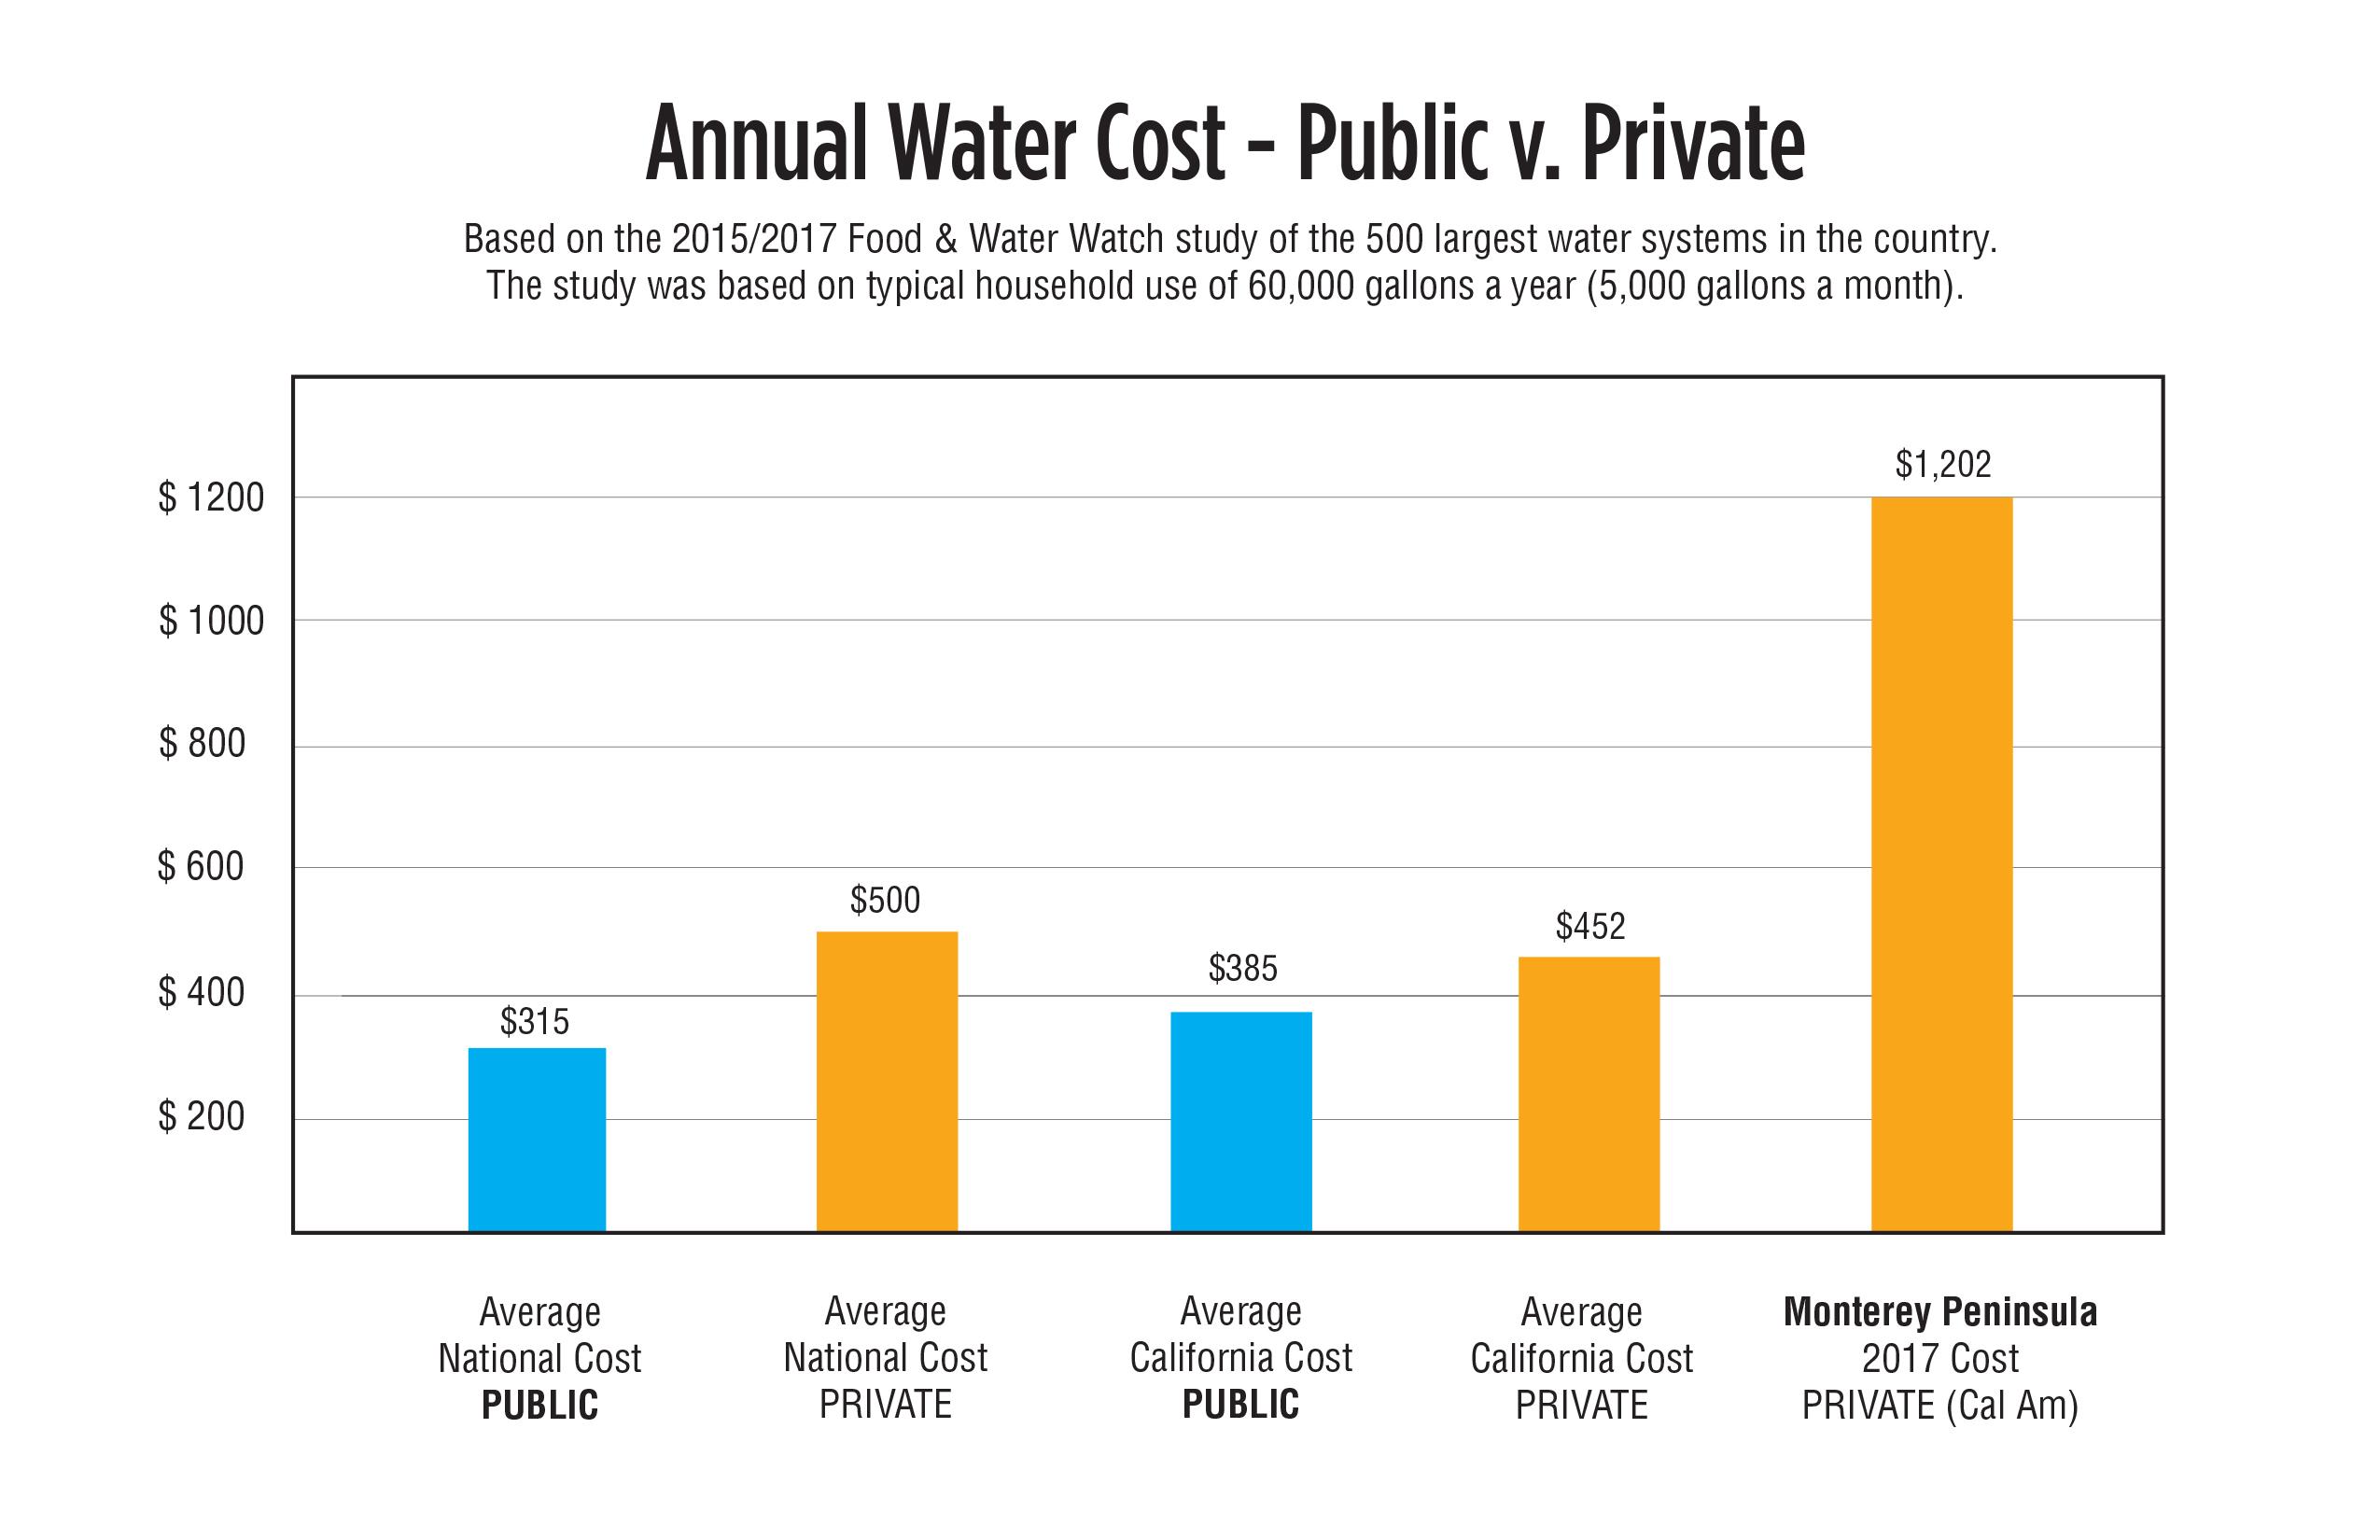 Public_v_Private_Cost_Chart.jpg